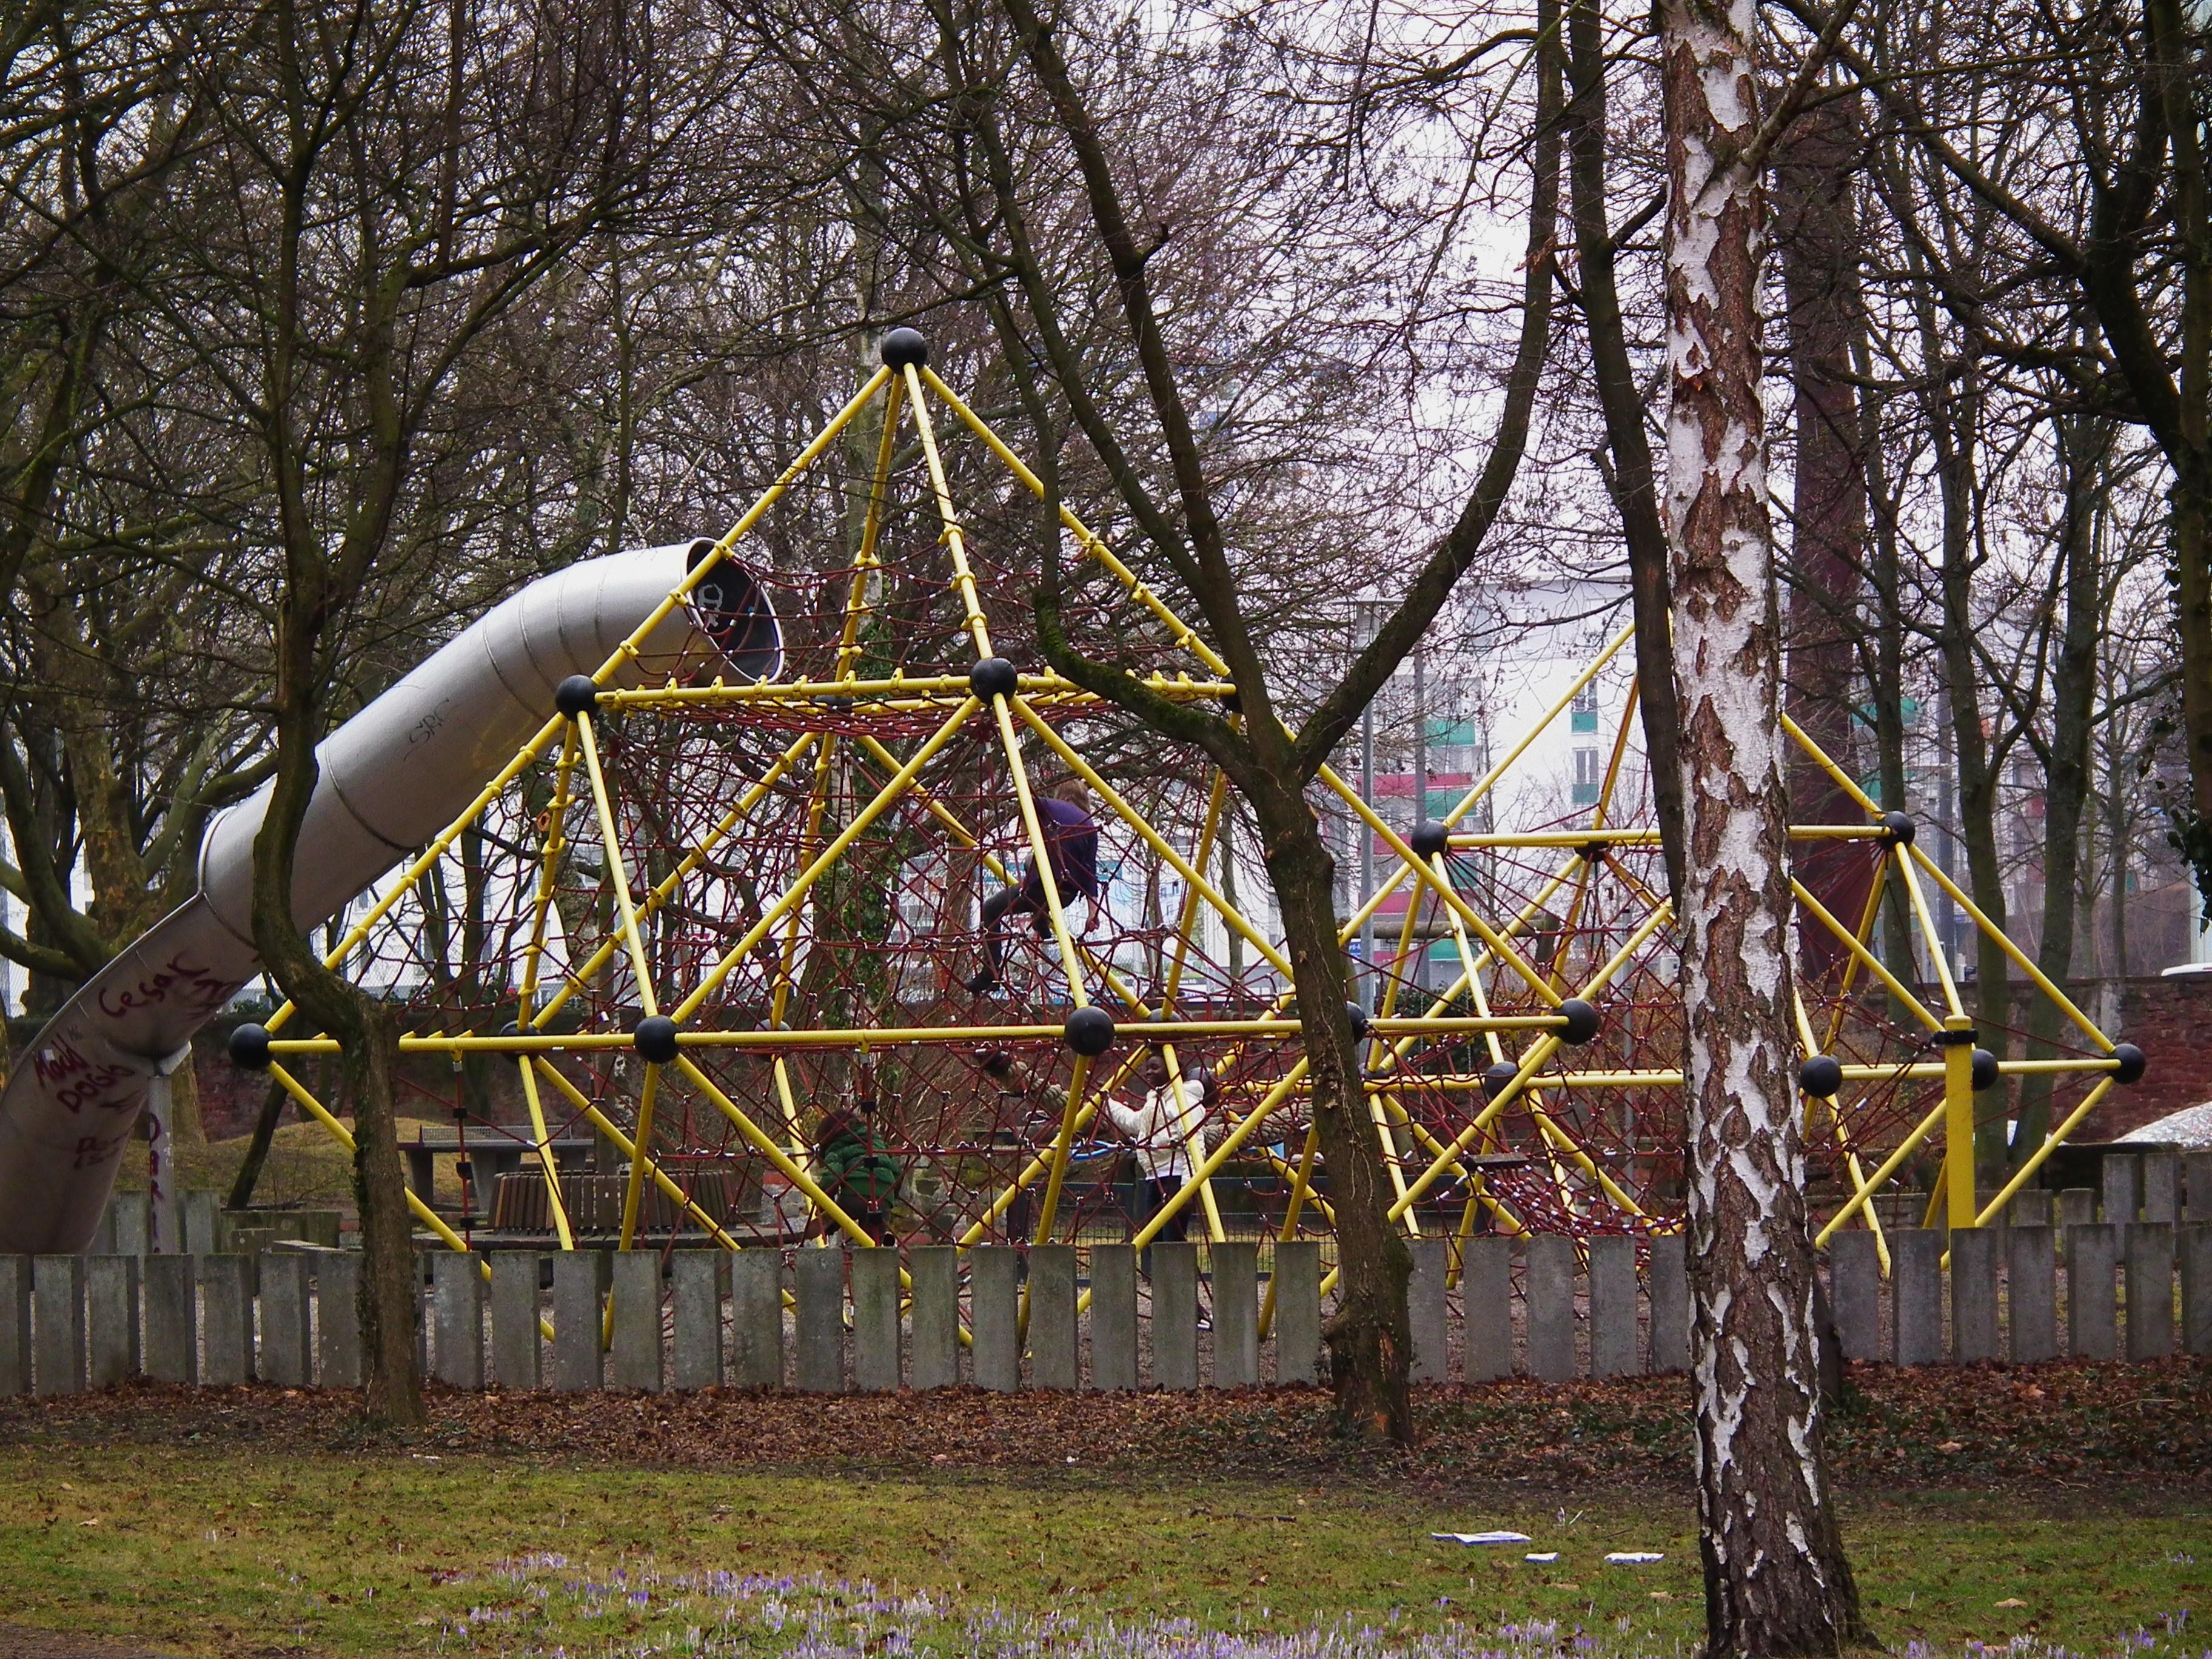 Kletterdreieck Alter : File:klettergerüst ka alter friedhof februar 2012.jpg wikimedia